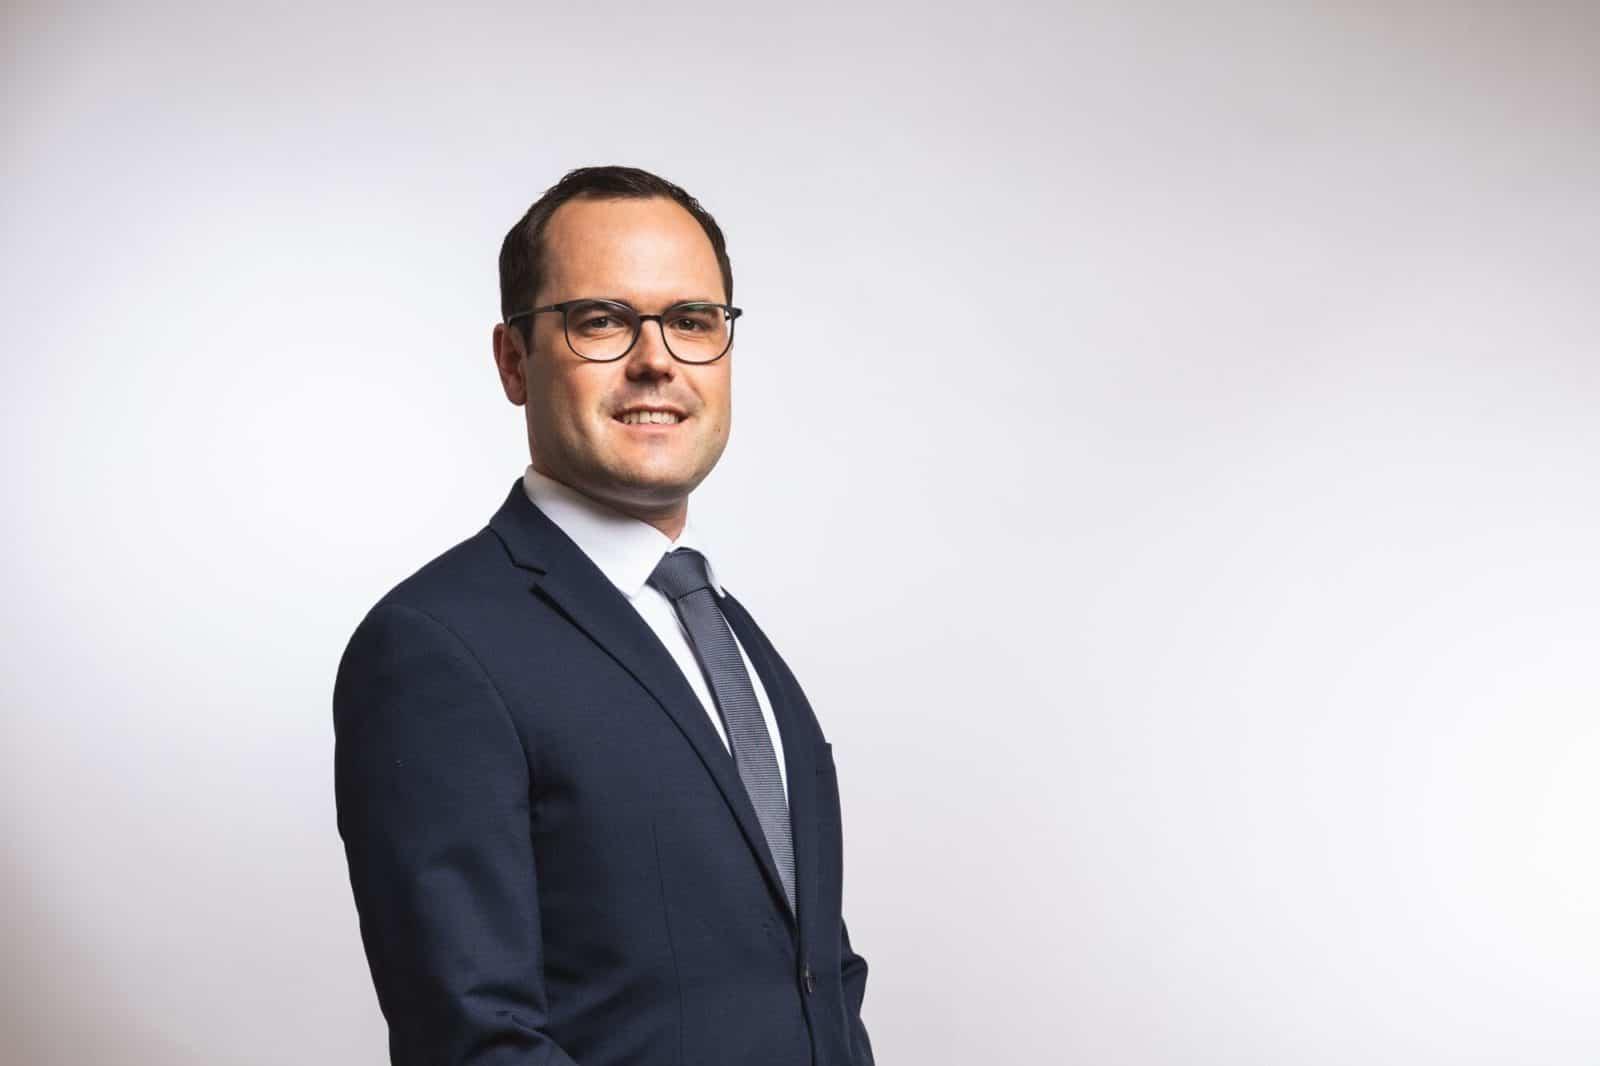 Peter Schnitzhofer